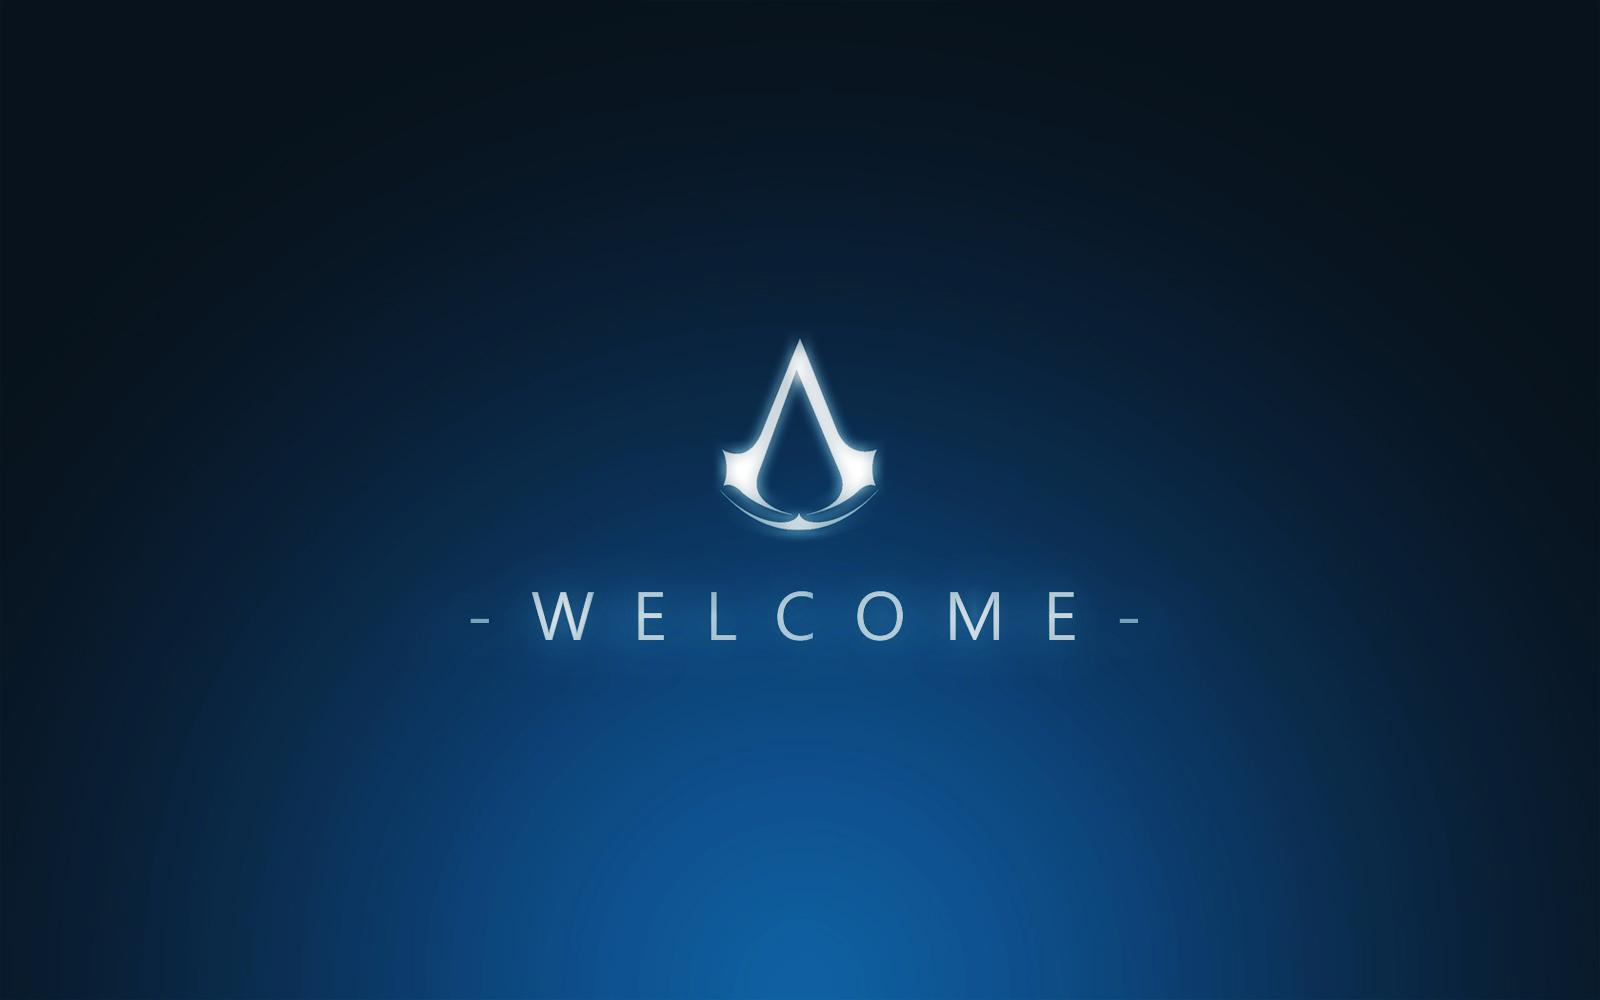 Welcome Assassin Games Logo Wallpaper Best Wallpaper with 1600x1000 1600x1000